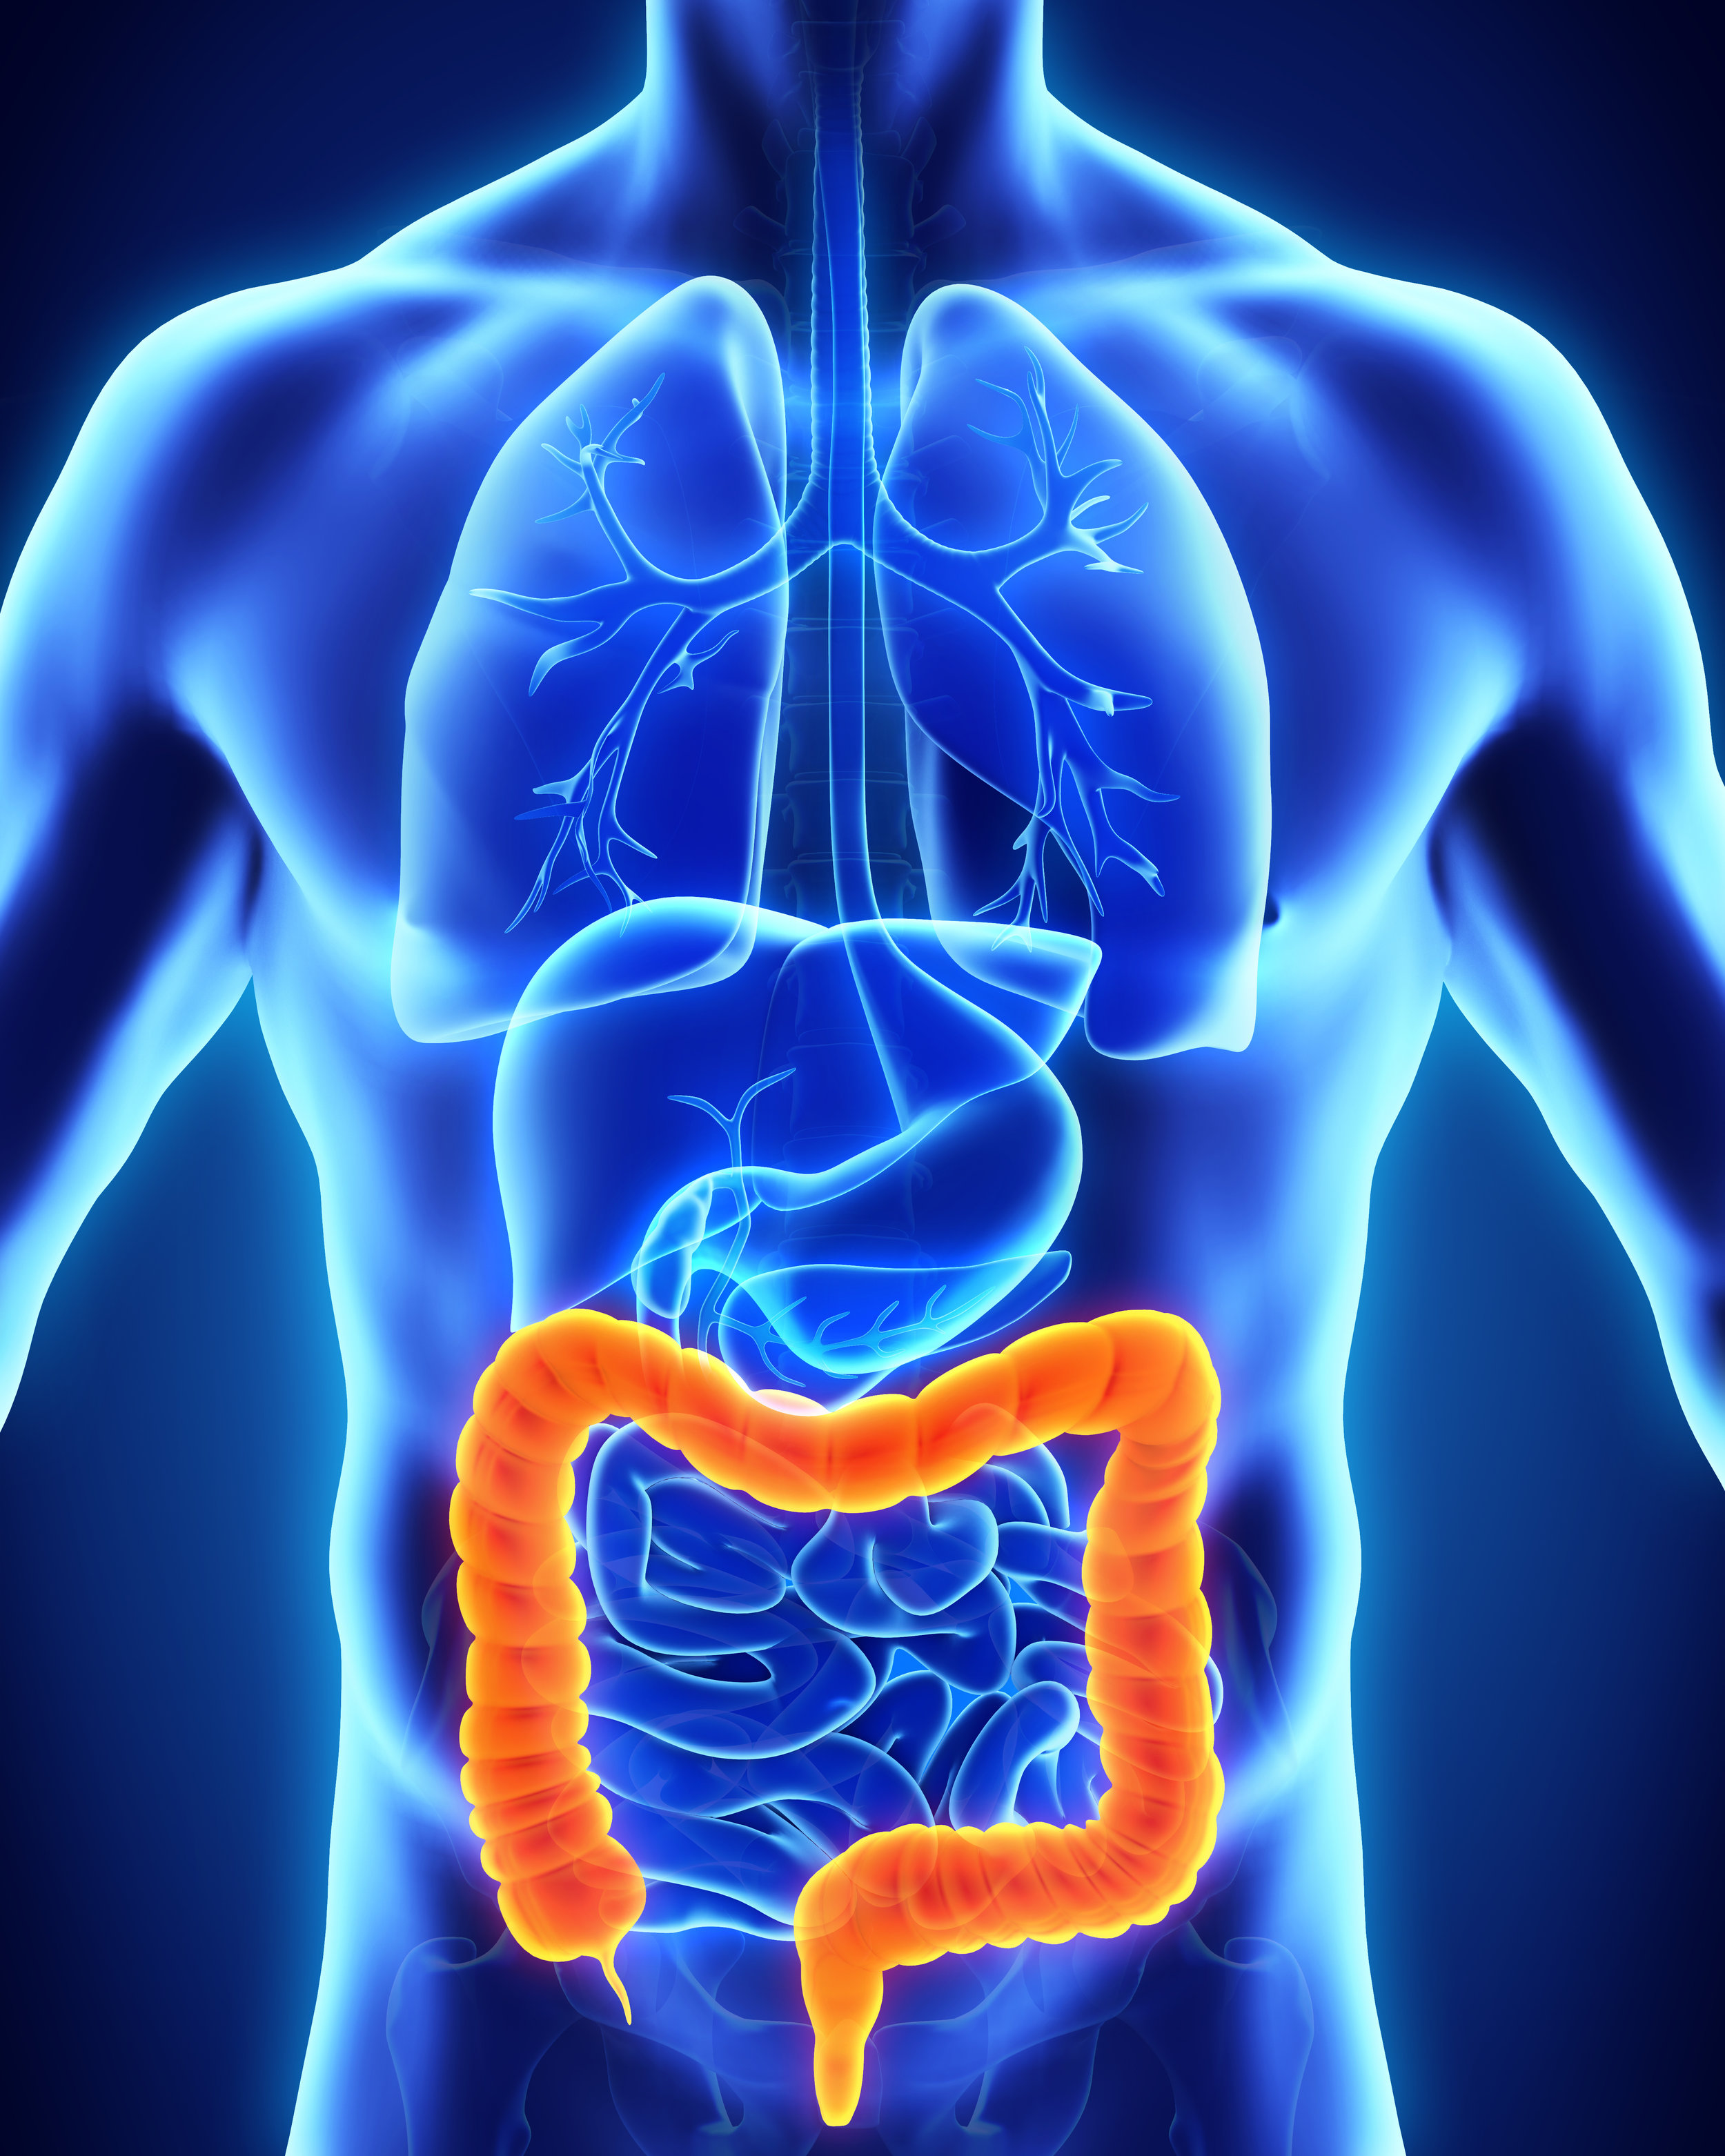 colon-or-large-intestine-structure